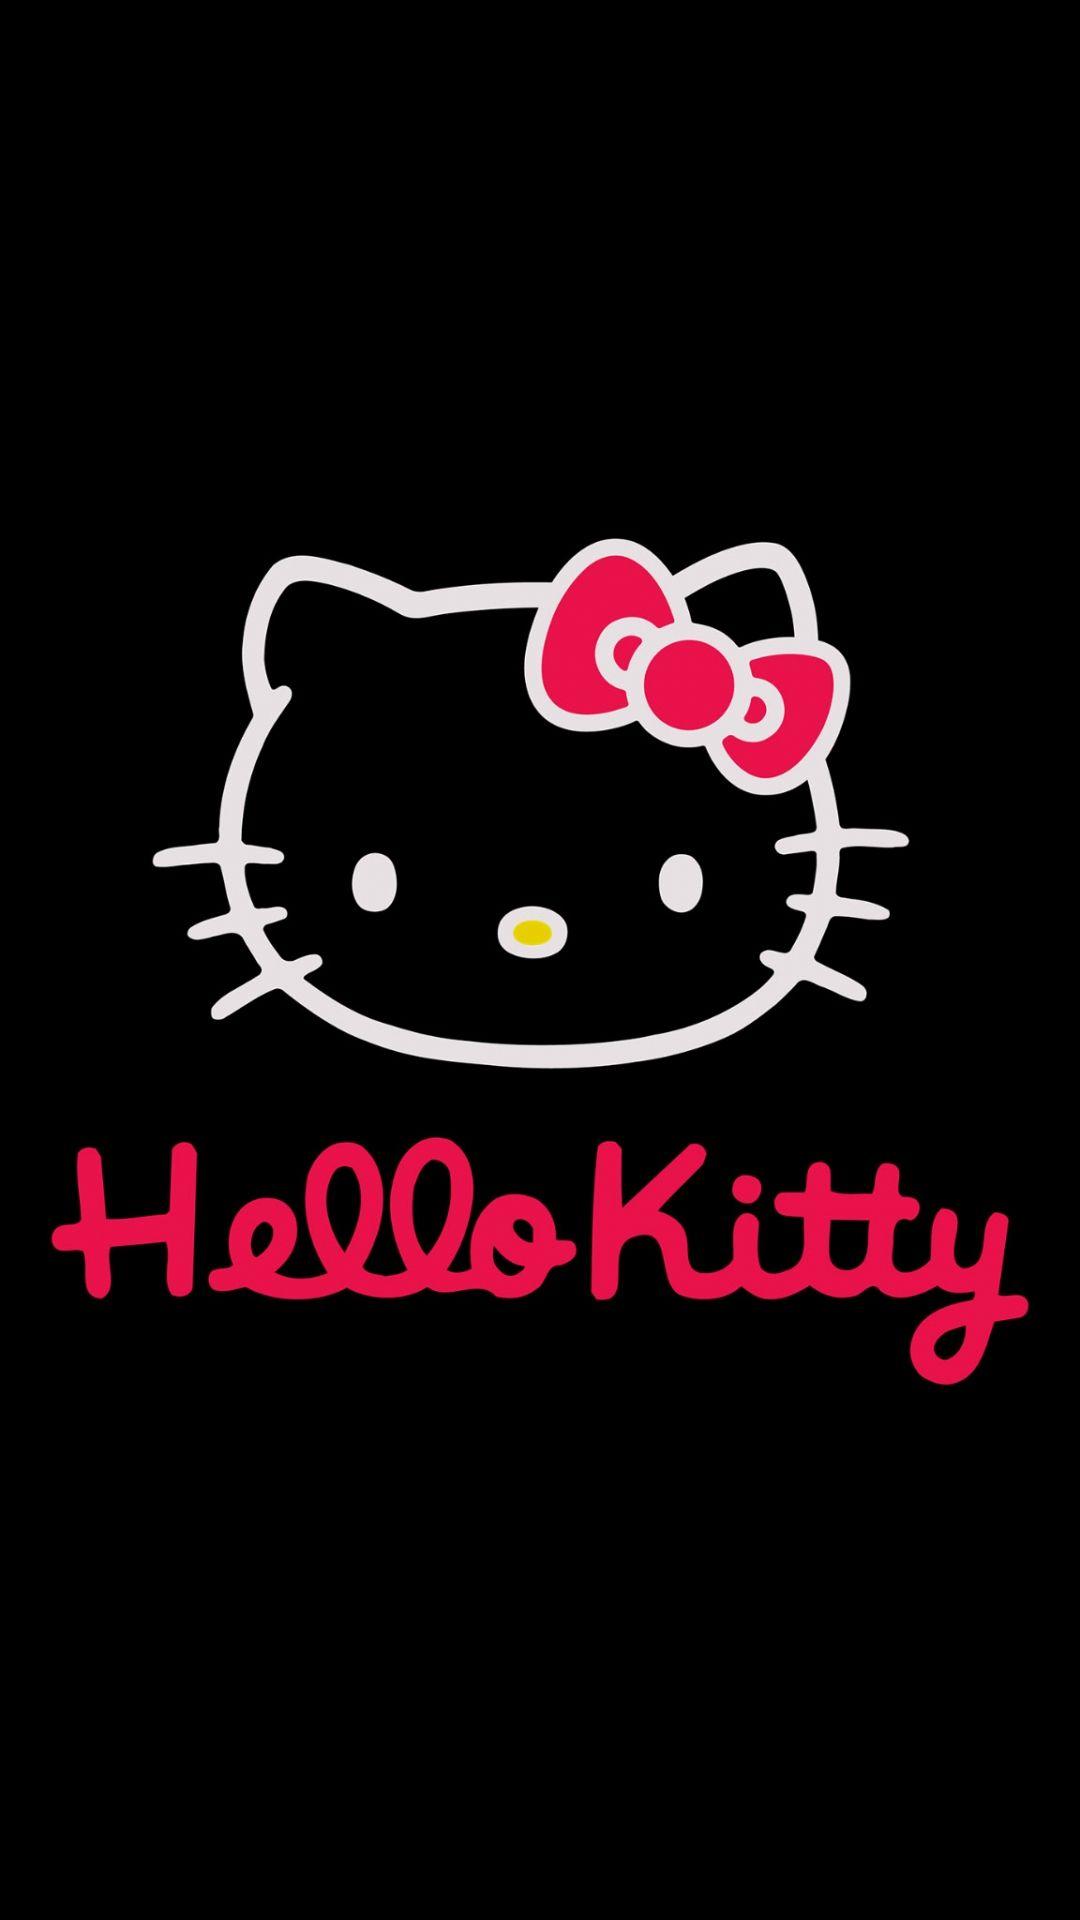 Black Hello Kitty Background Picture Hello Kitty Backgrounds Hello Kitty Wallpaper Hd Hello Kitty Art